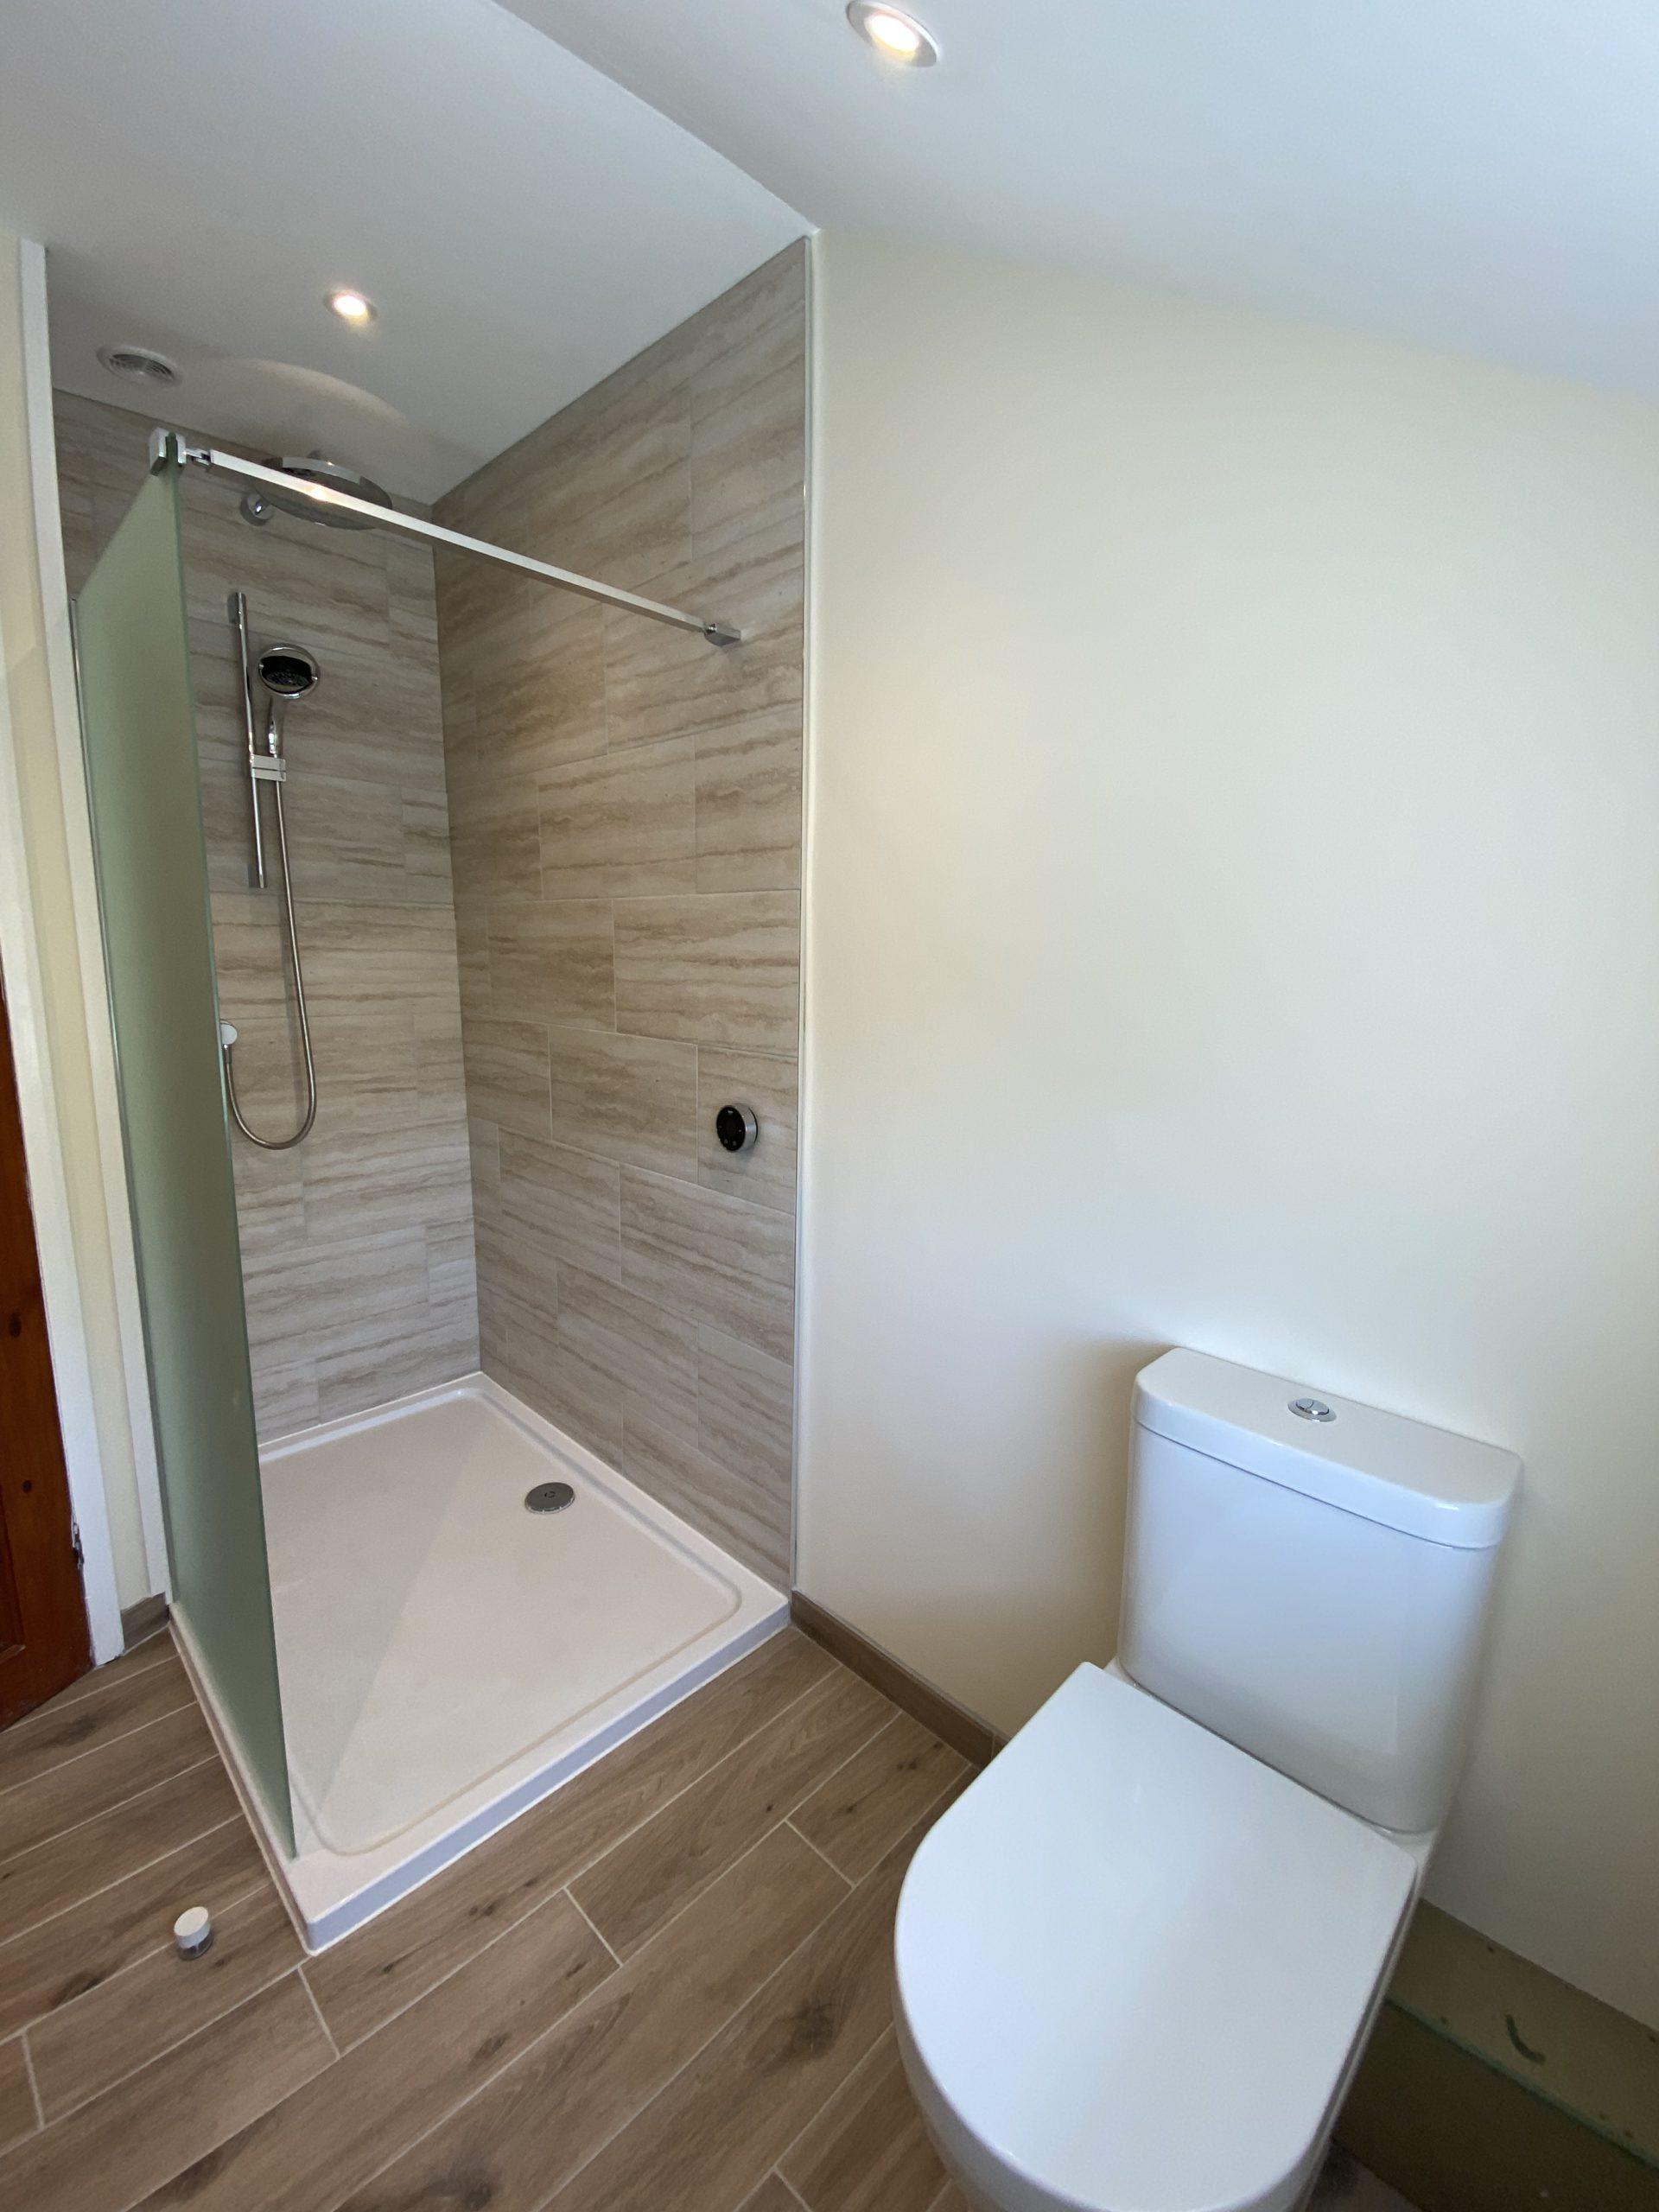 Space-saving wet room